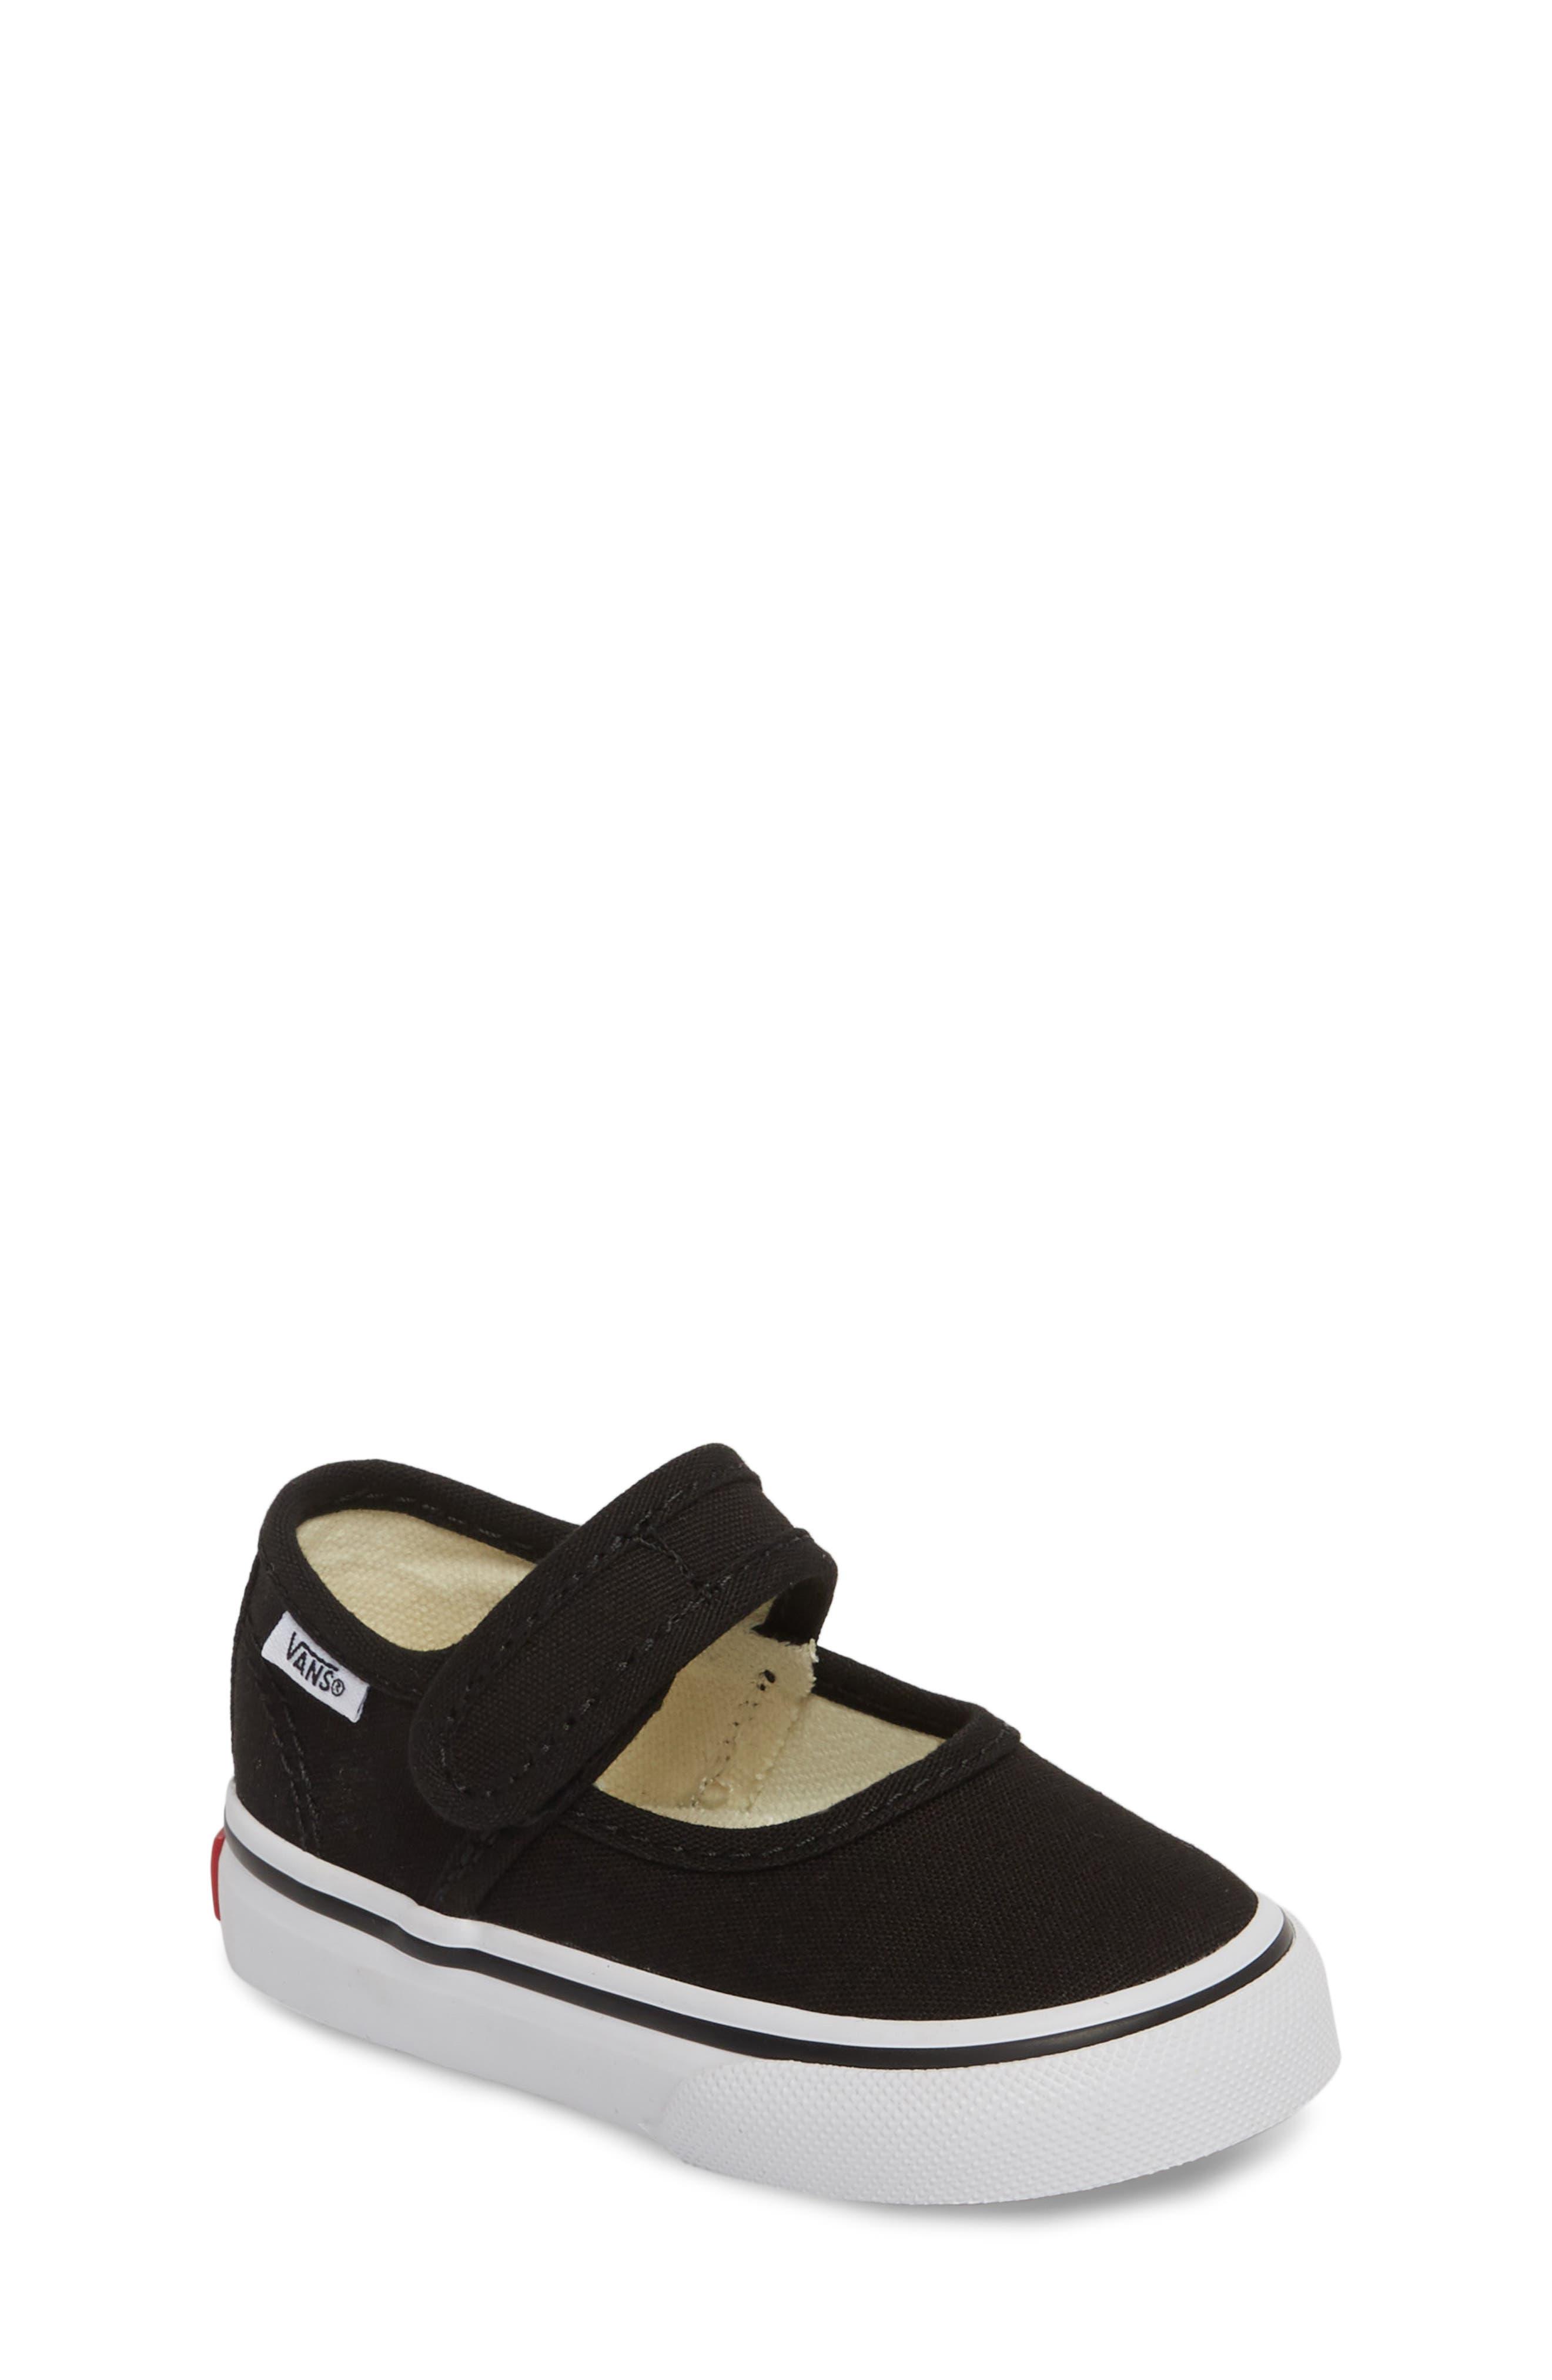 Vans Mary Jane Sneaker (Baby, Walker & Toddler)